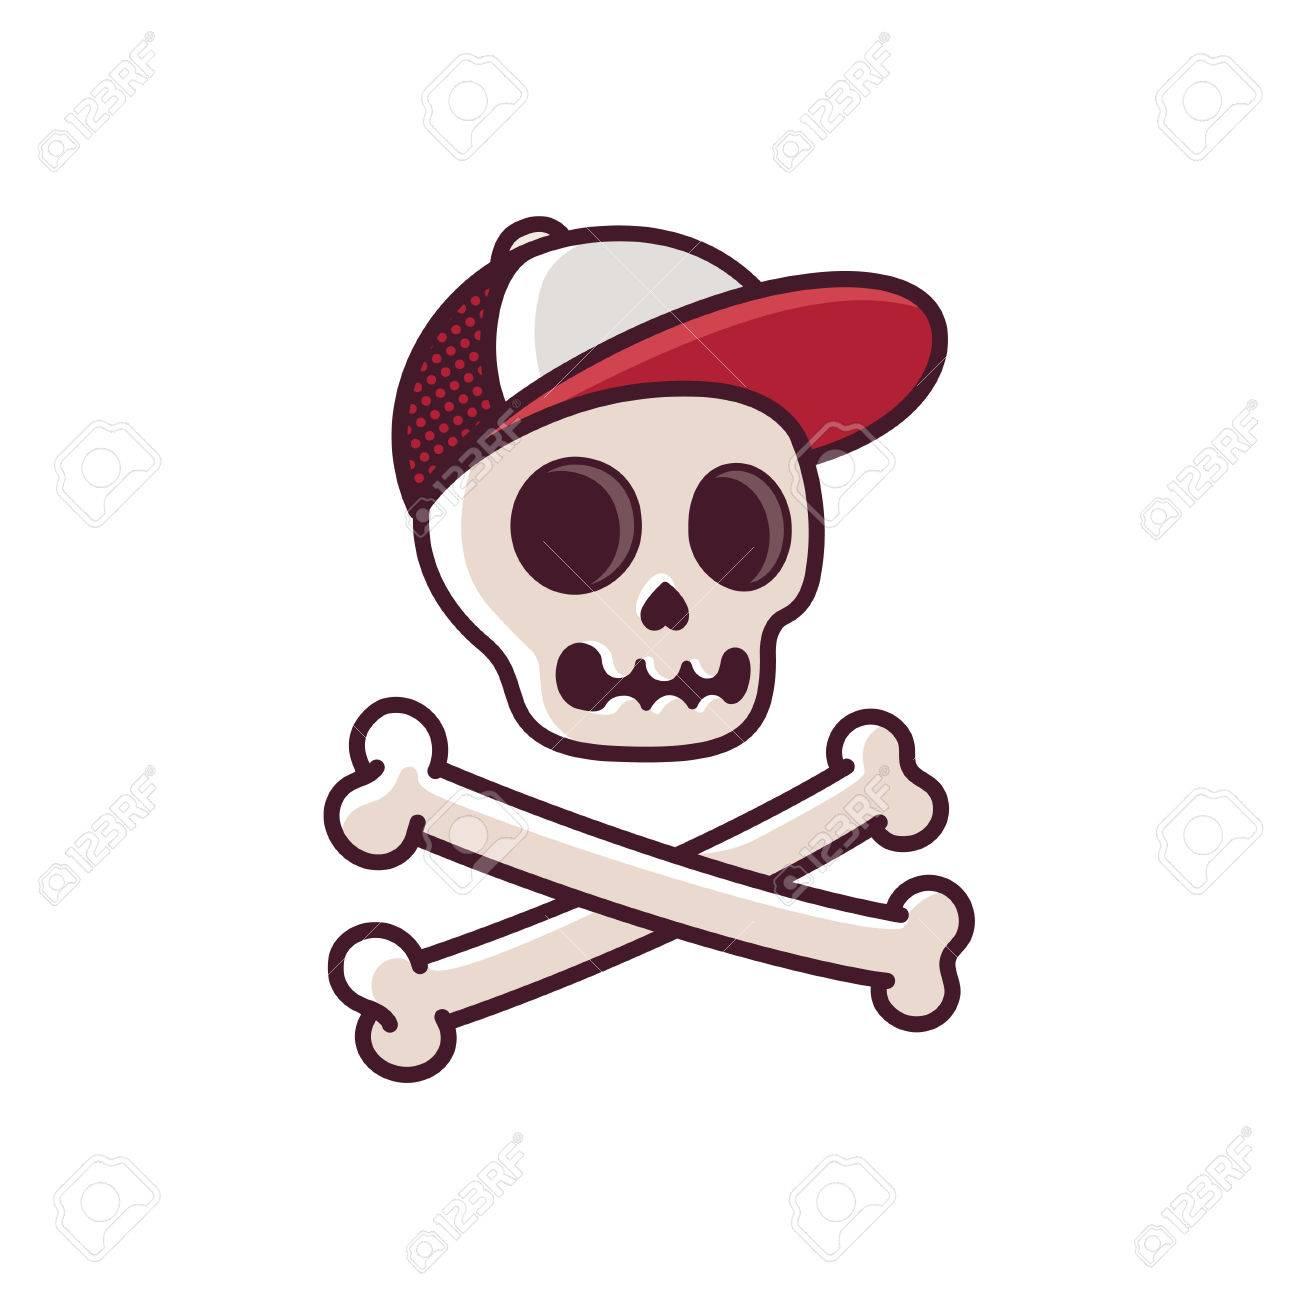 1300x1300 Cartoon Human Skull In Baseball Cap With Crossbones. Cool Comic